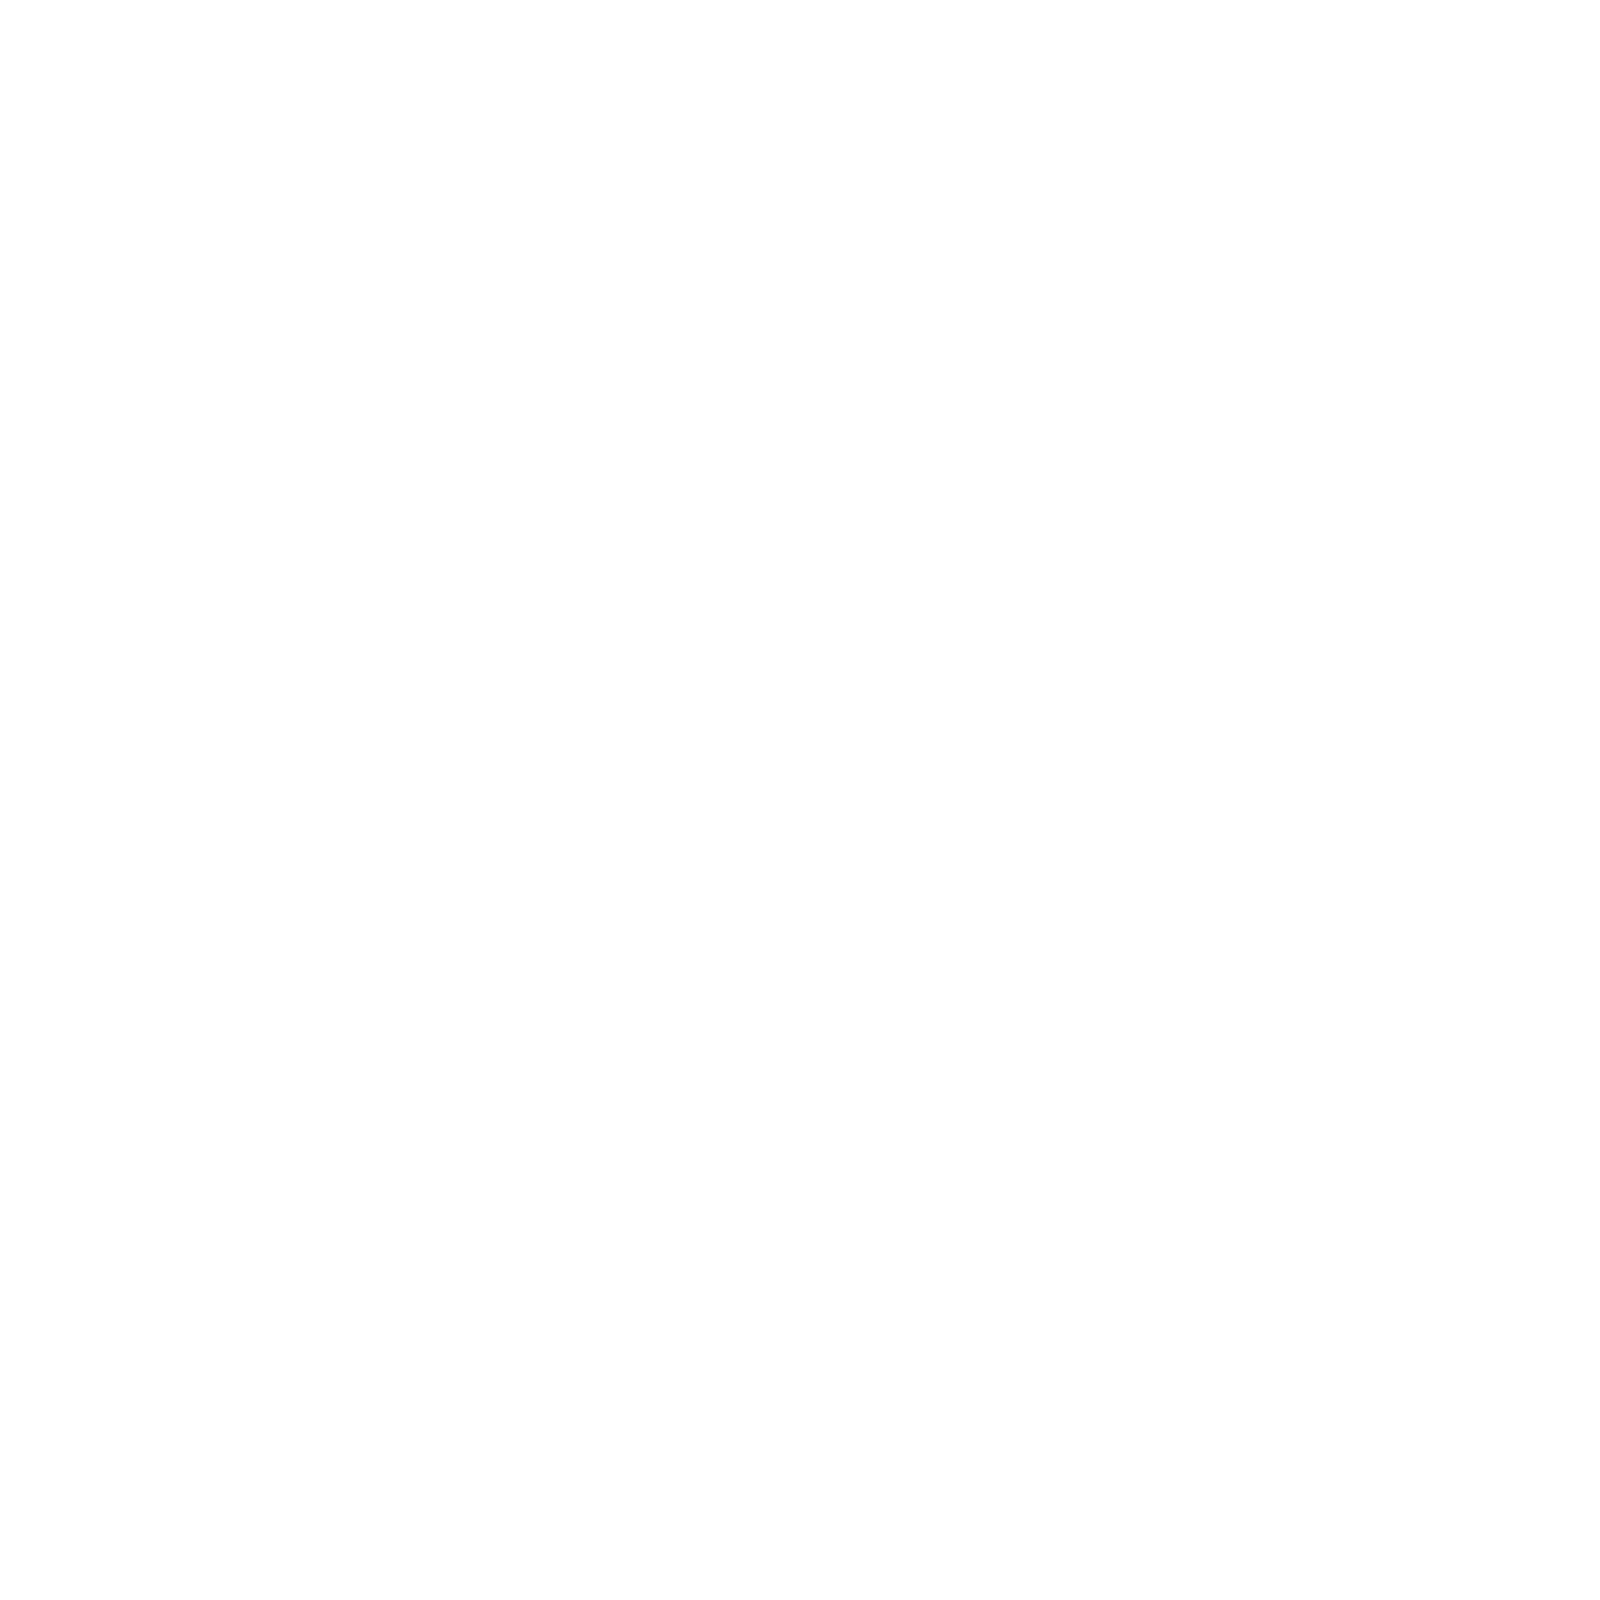 globacap-logo.original-white.png